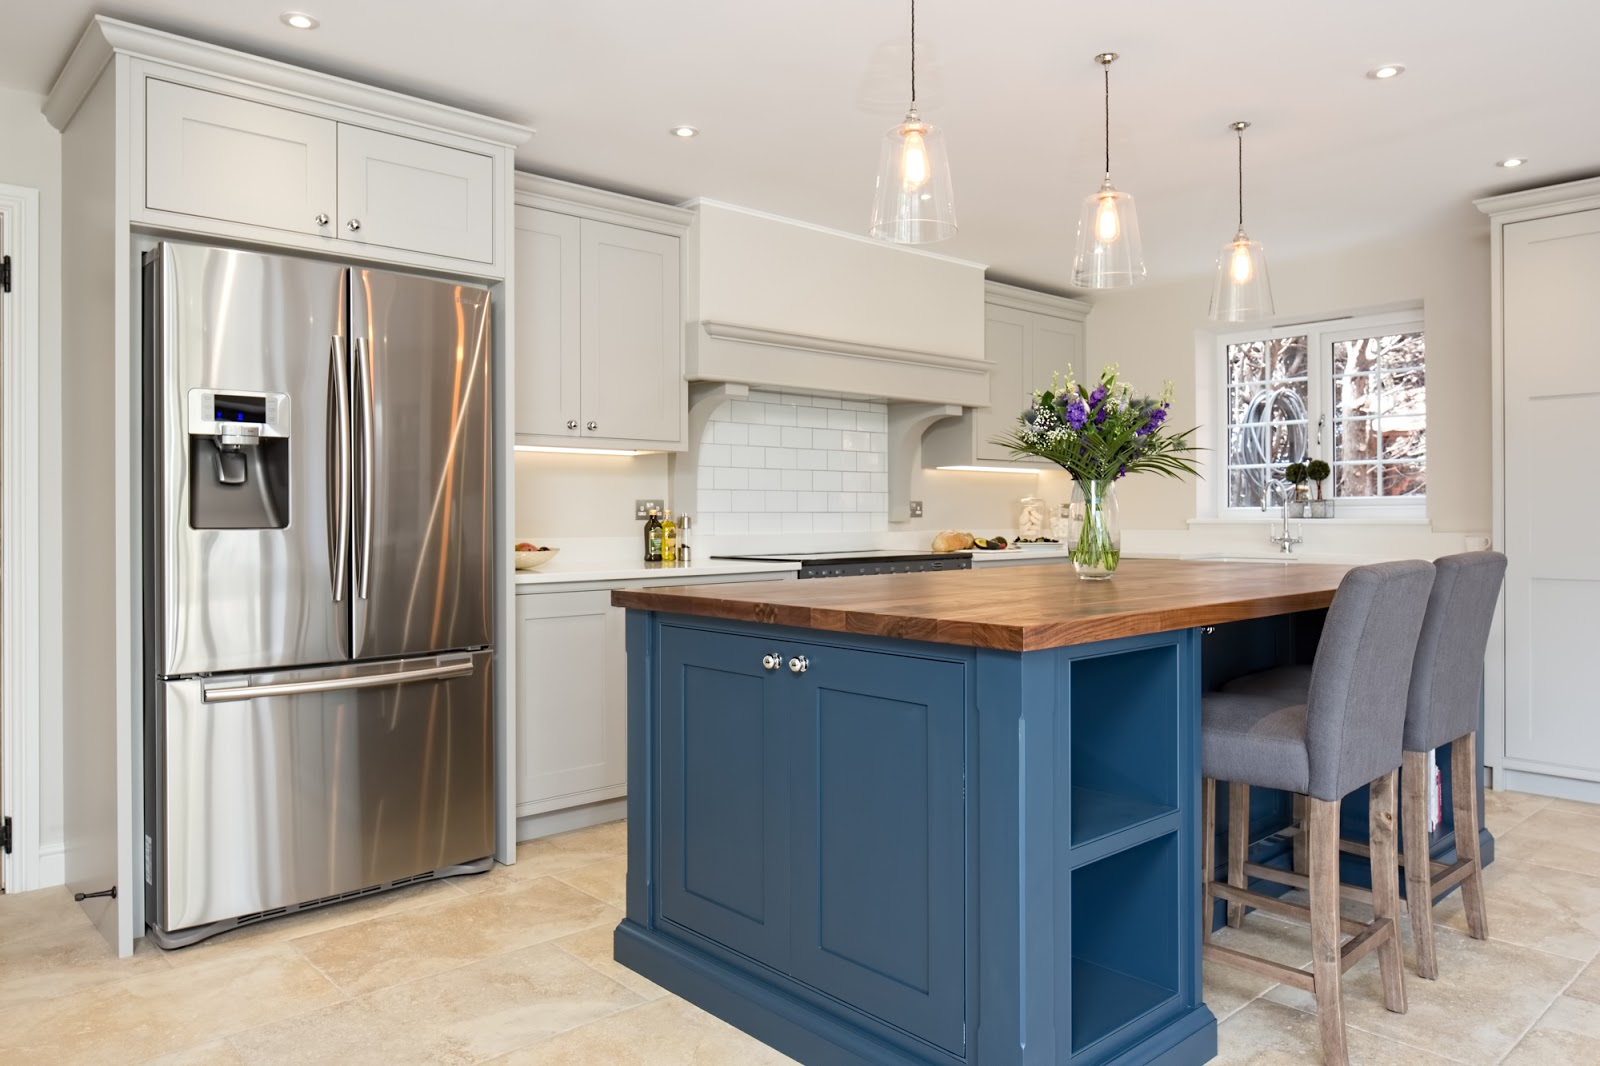 Maple & Gray: Blue & Grey Kitchen